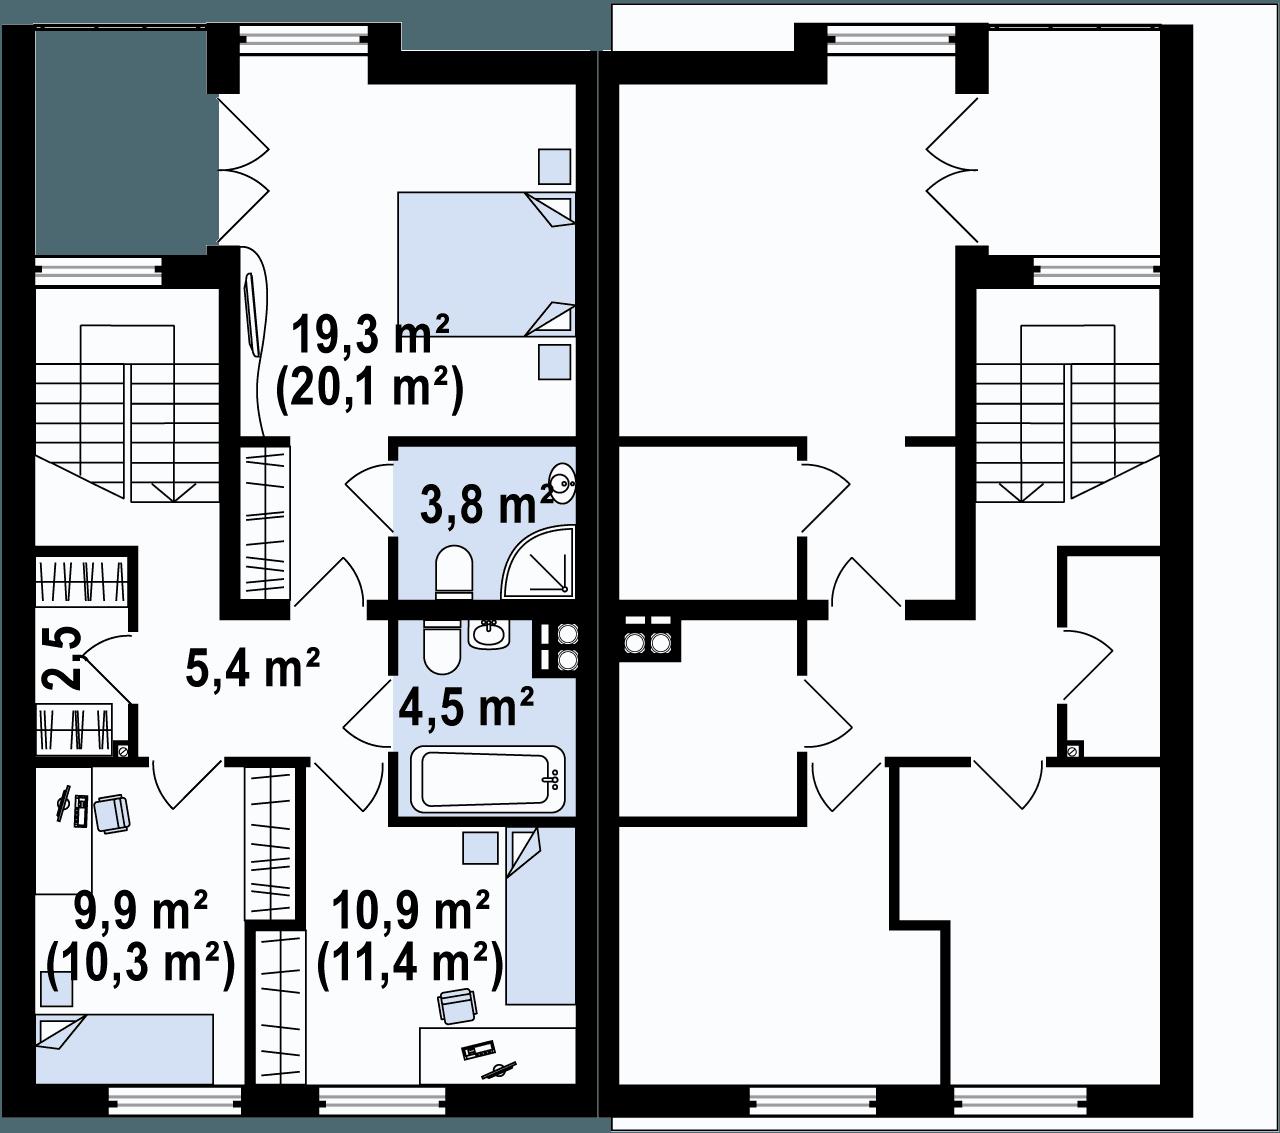 Rzut poddasza/piętra